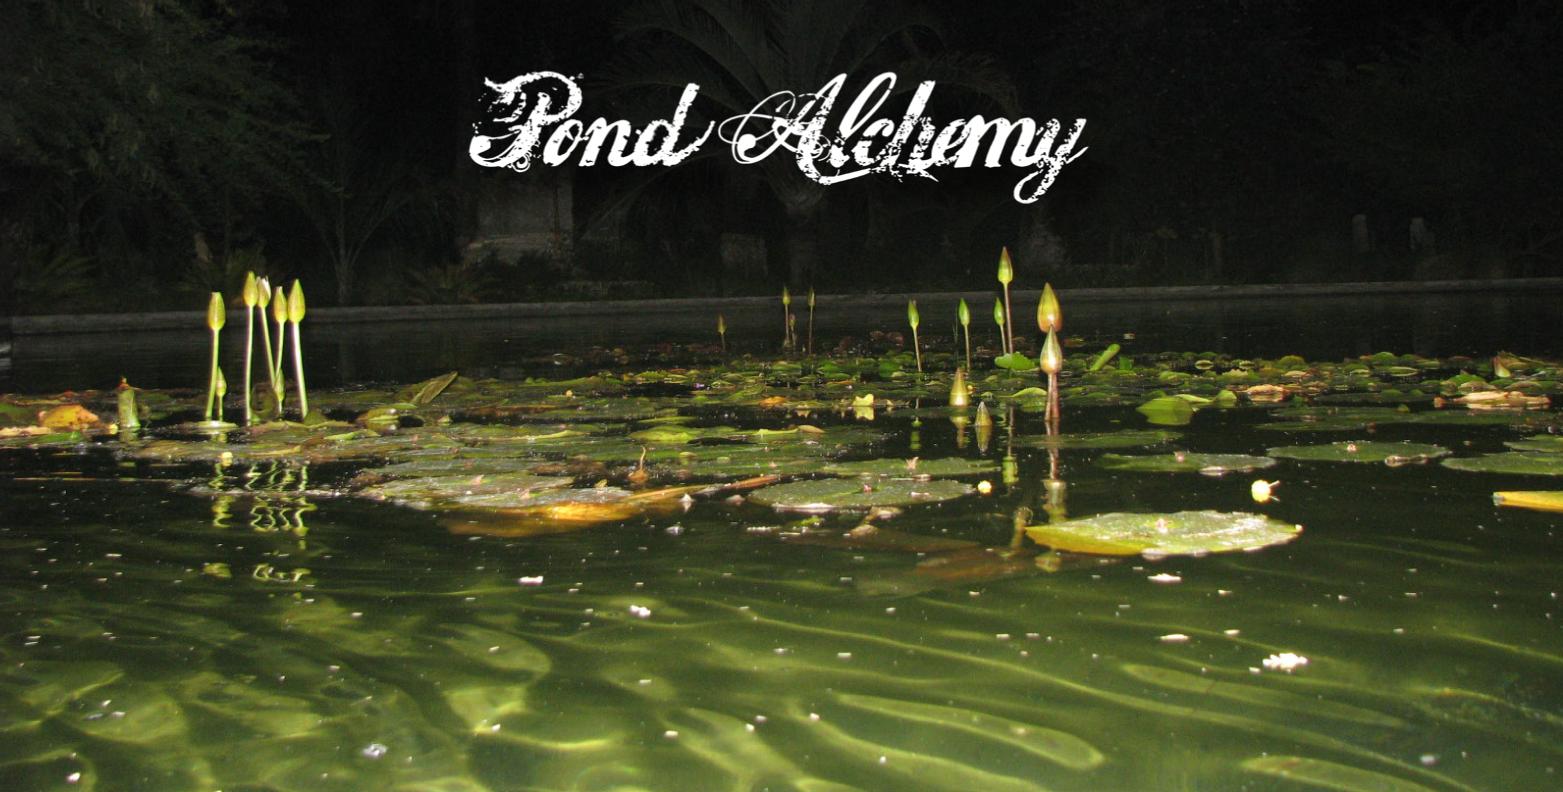 Miami Pond Construction